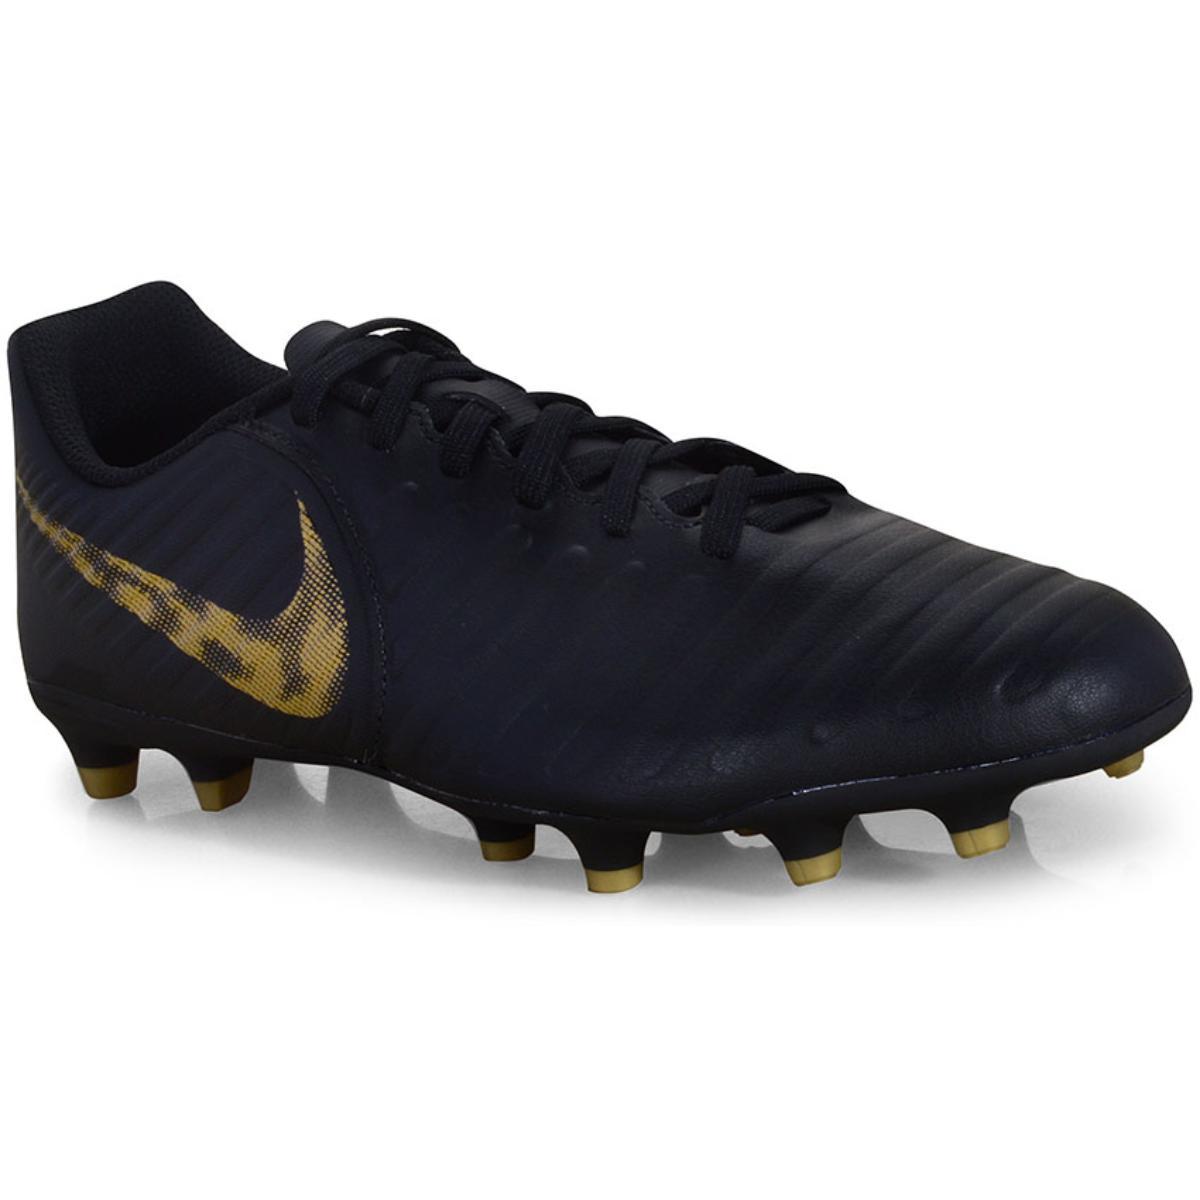 Chuteira Masculina Nike Ao2597-077 Legend 7 Club Preto/dourado